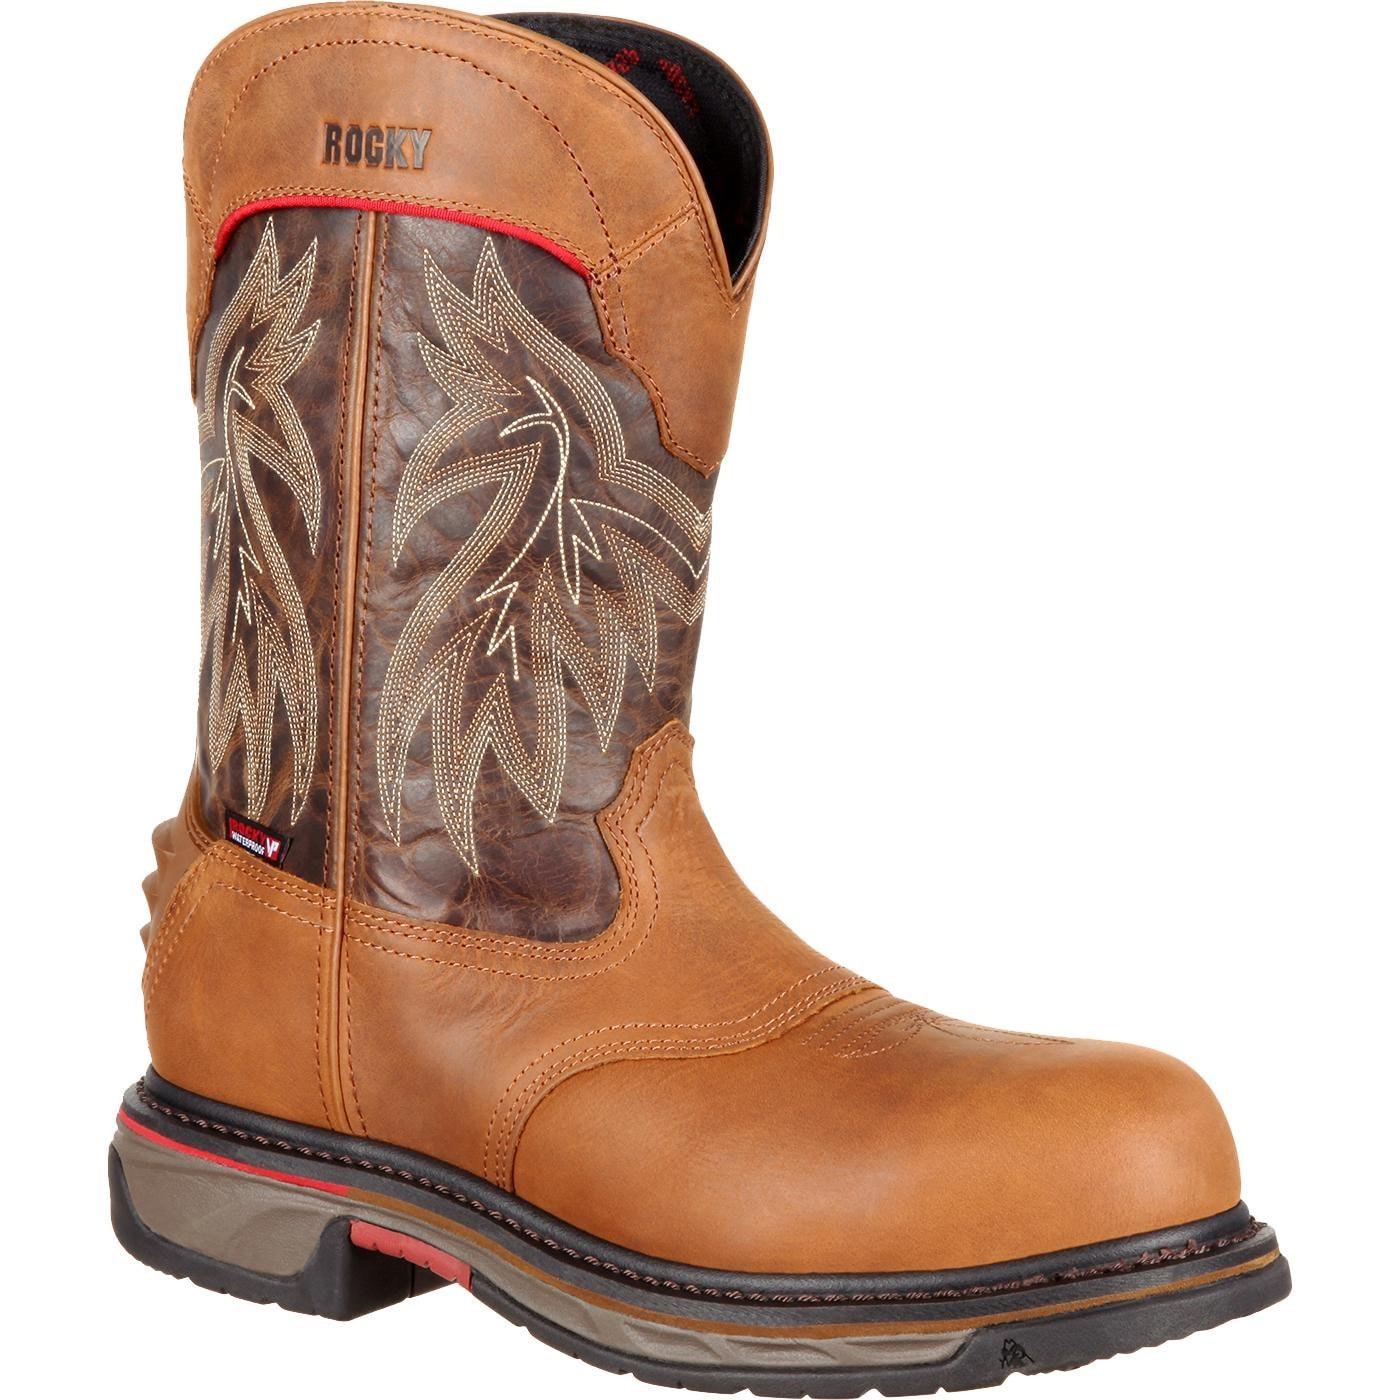 44d9d382bdd Rocky Iron Skull: Men's Composite Toe Western Boot, #RKW0203